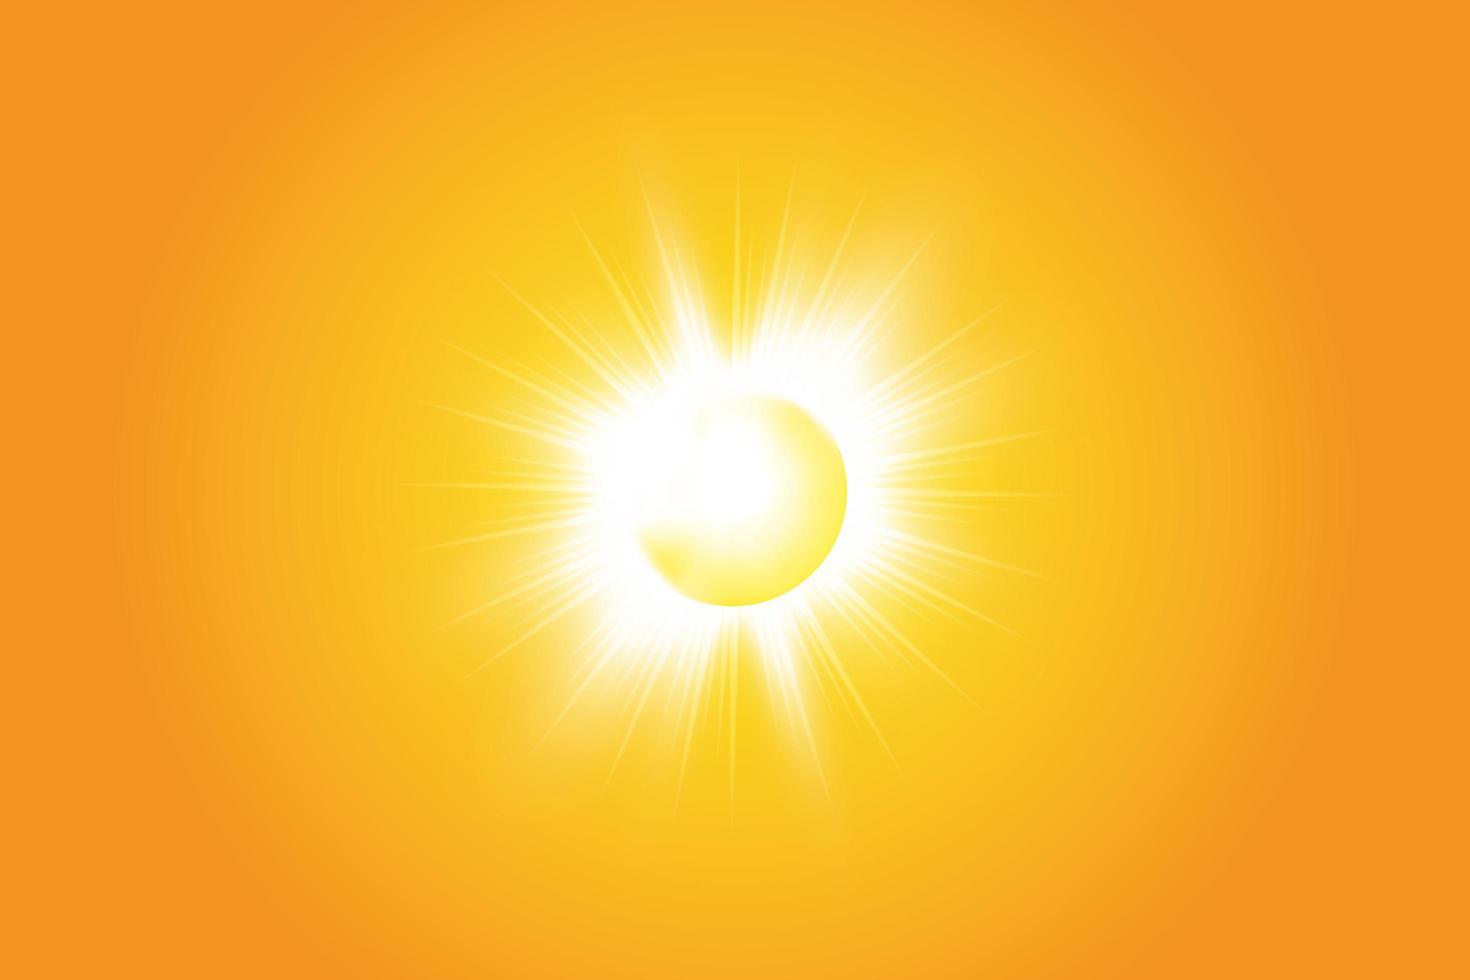 soleil brillant brillant sur jaune vecteur